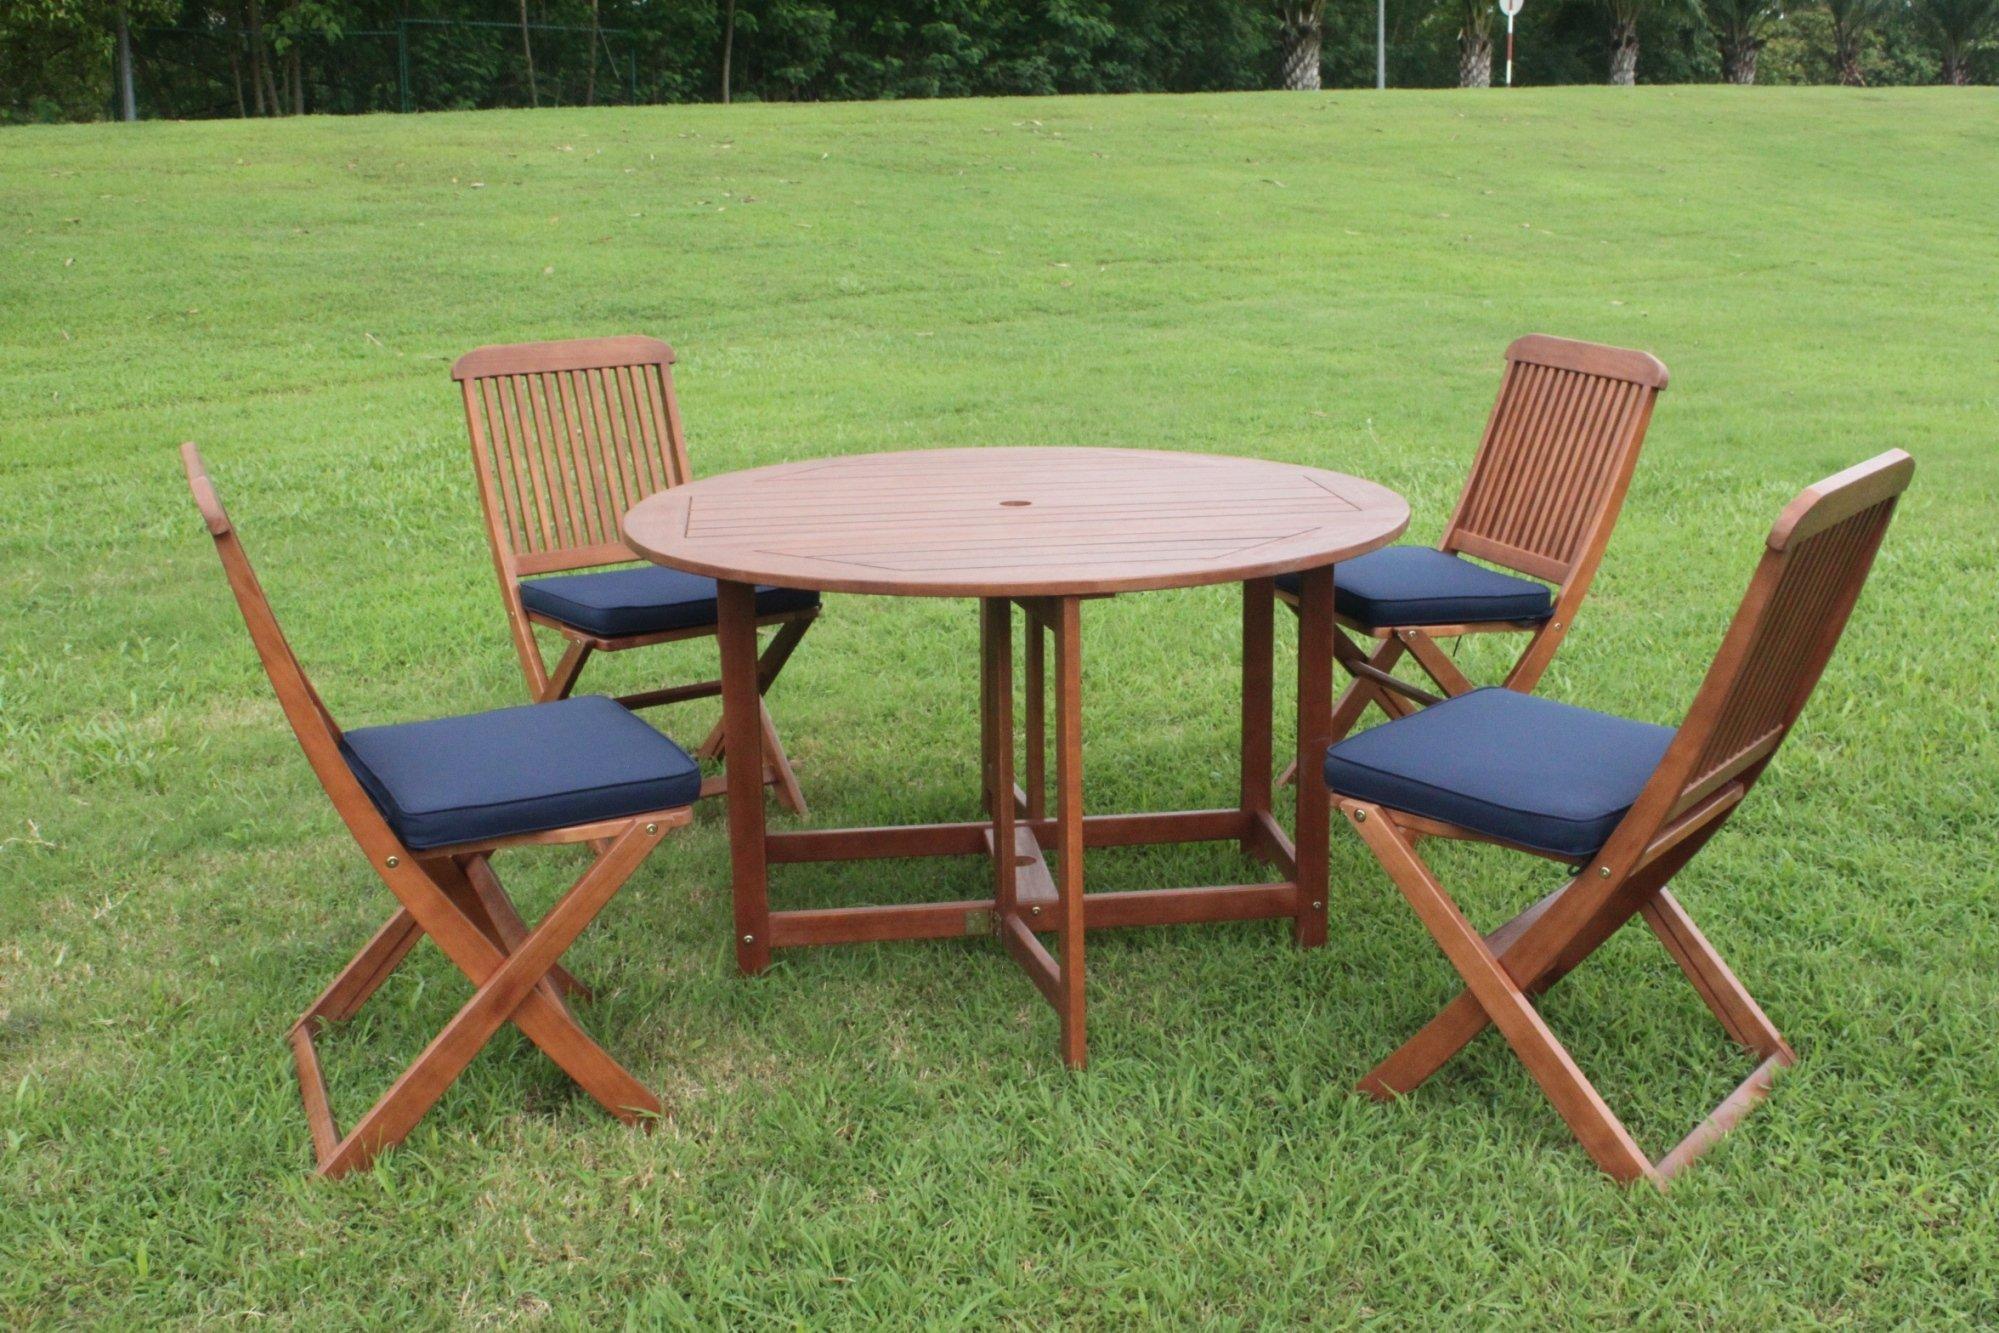 Folding Dining Table Set 4 Seater: Elegance 4 Seater Folding Round Patio Dining Set